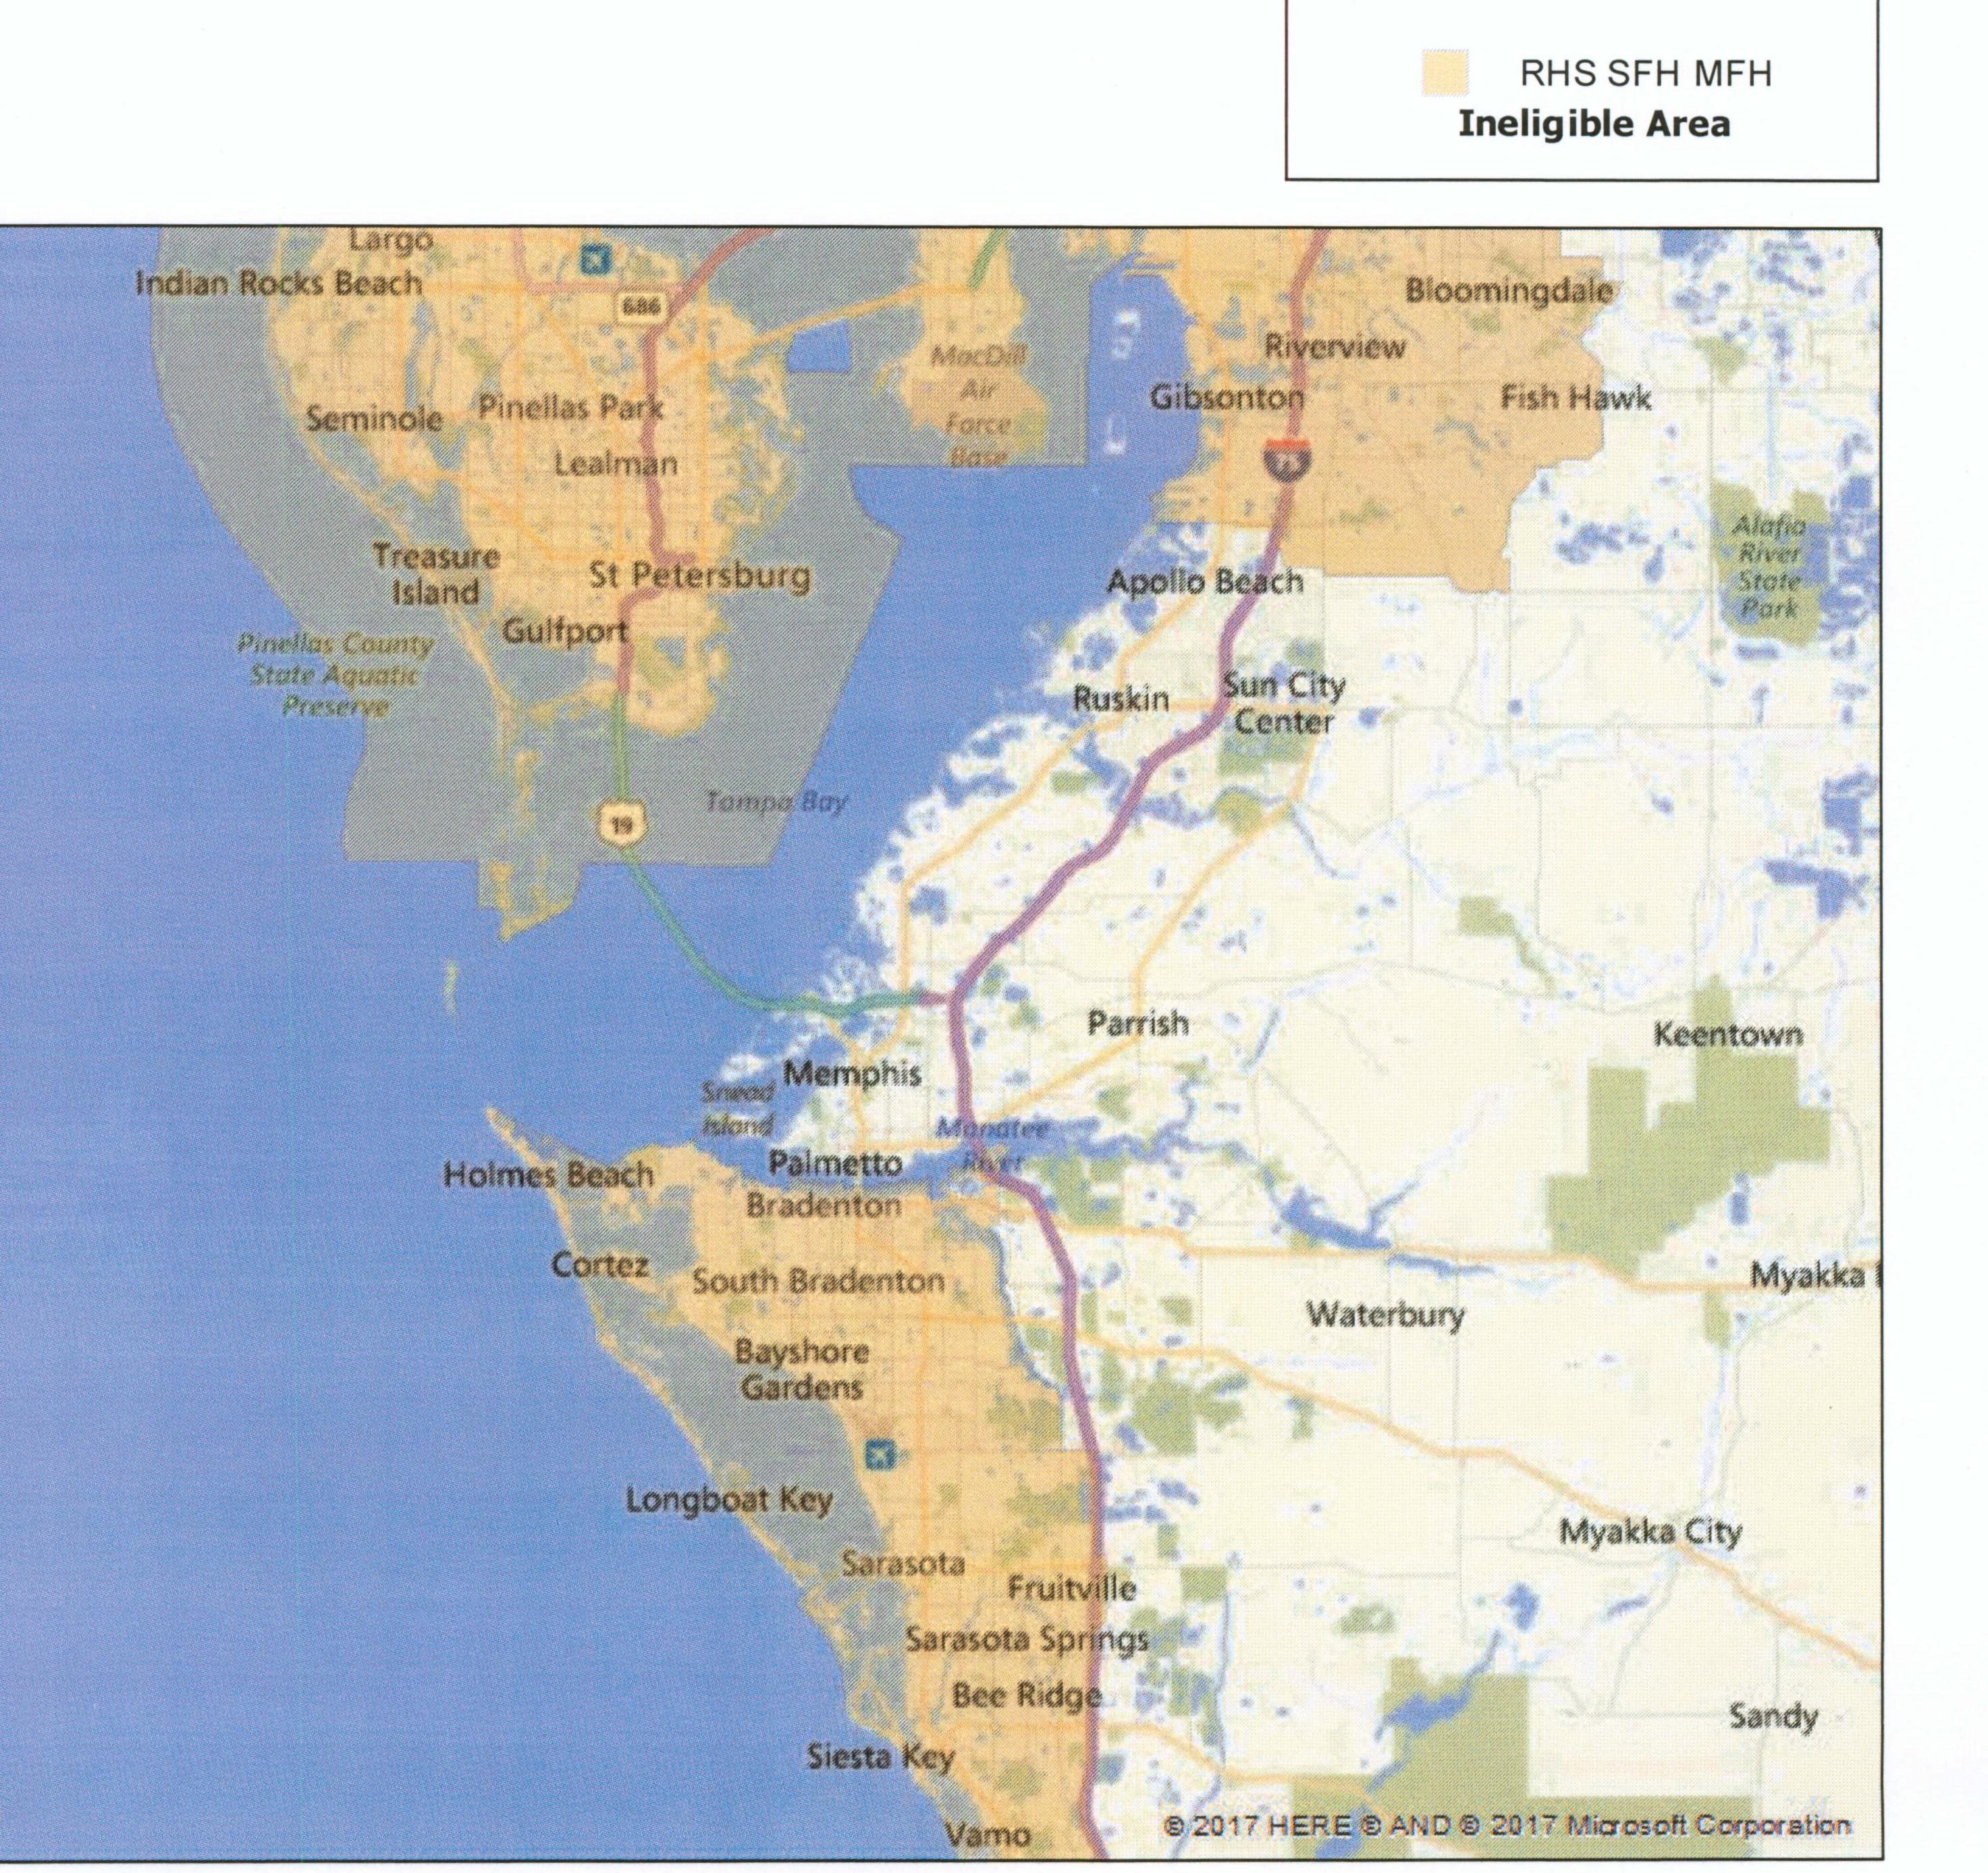 Usda Loan | Multiline Mortgage | (941) 201-9111 | Multiline Mortgage - Usda Eligibility Map For Florida